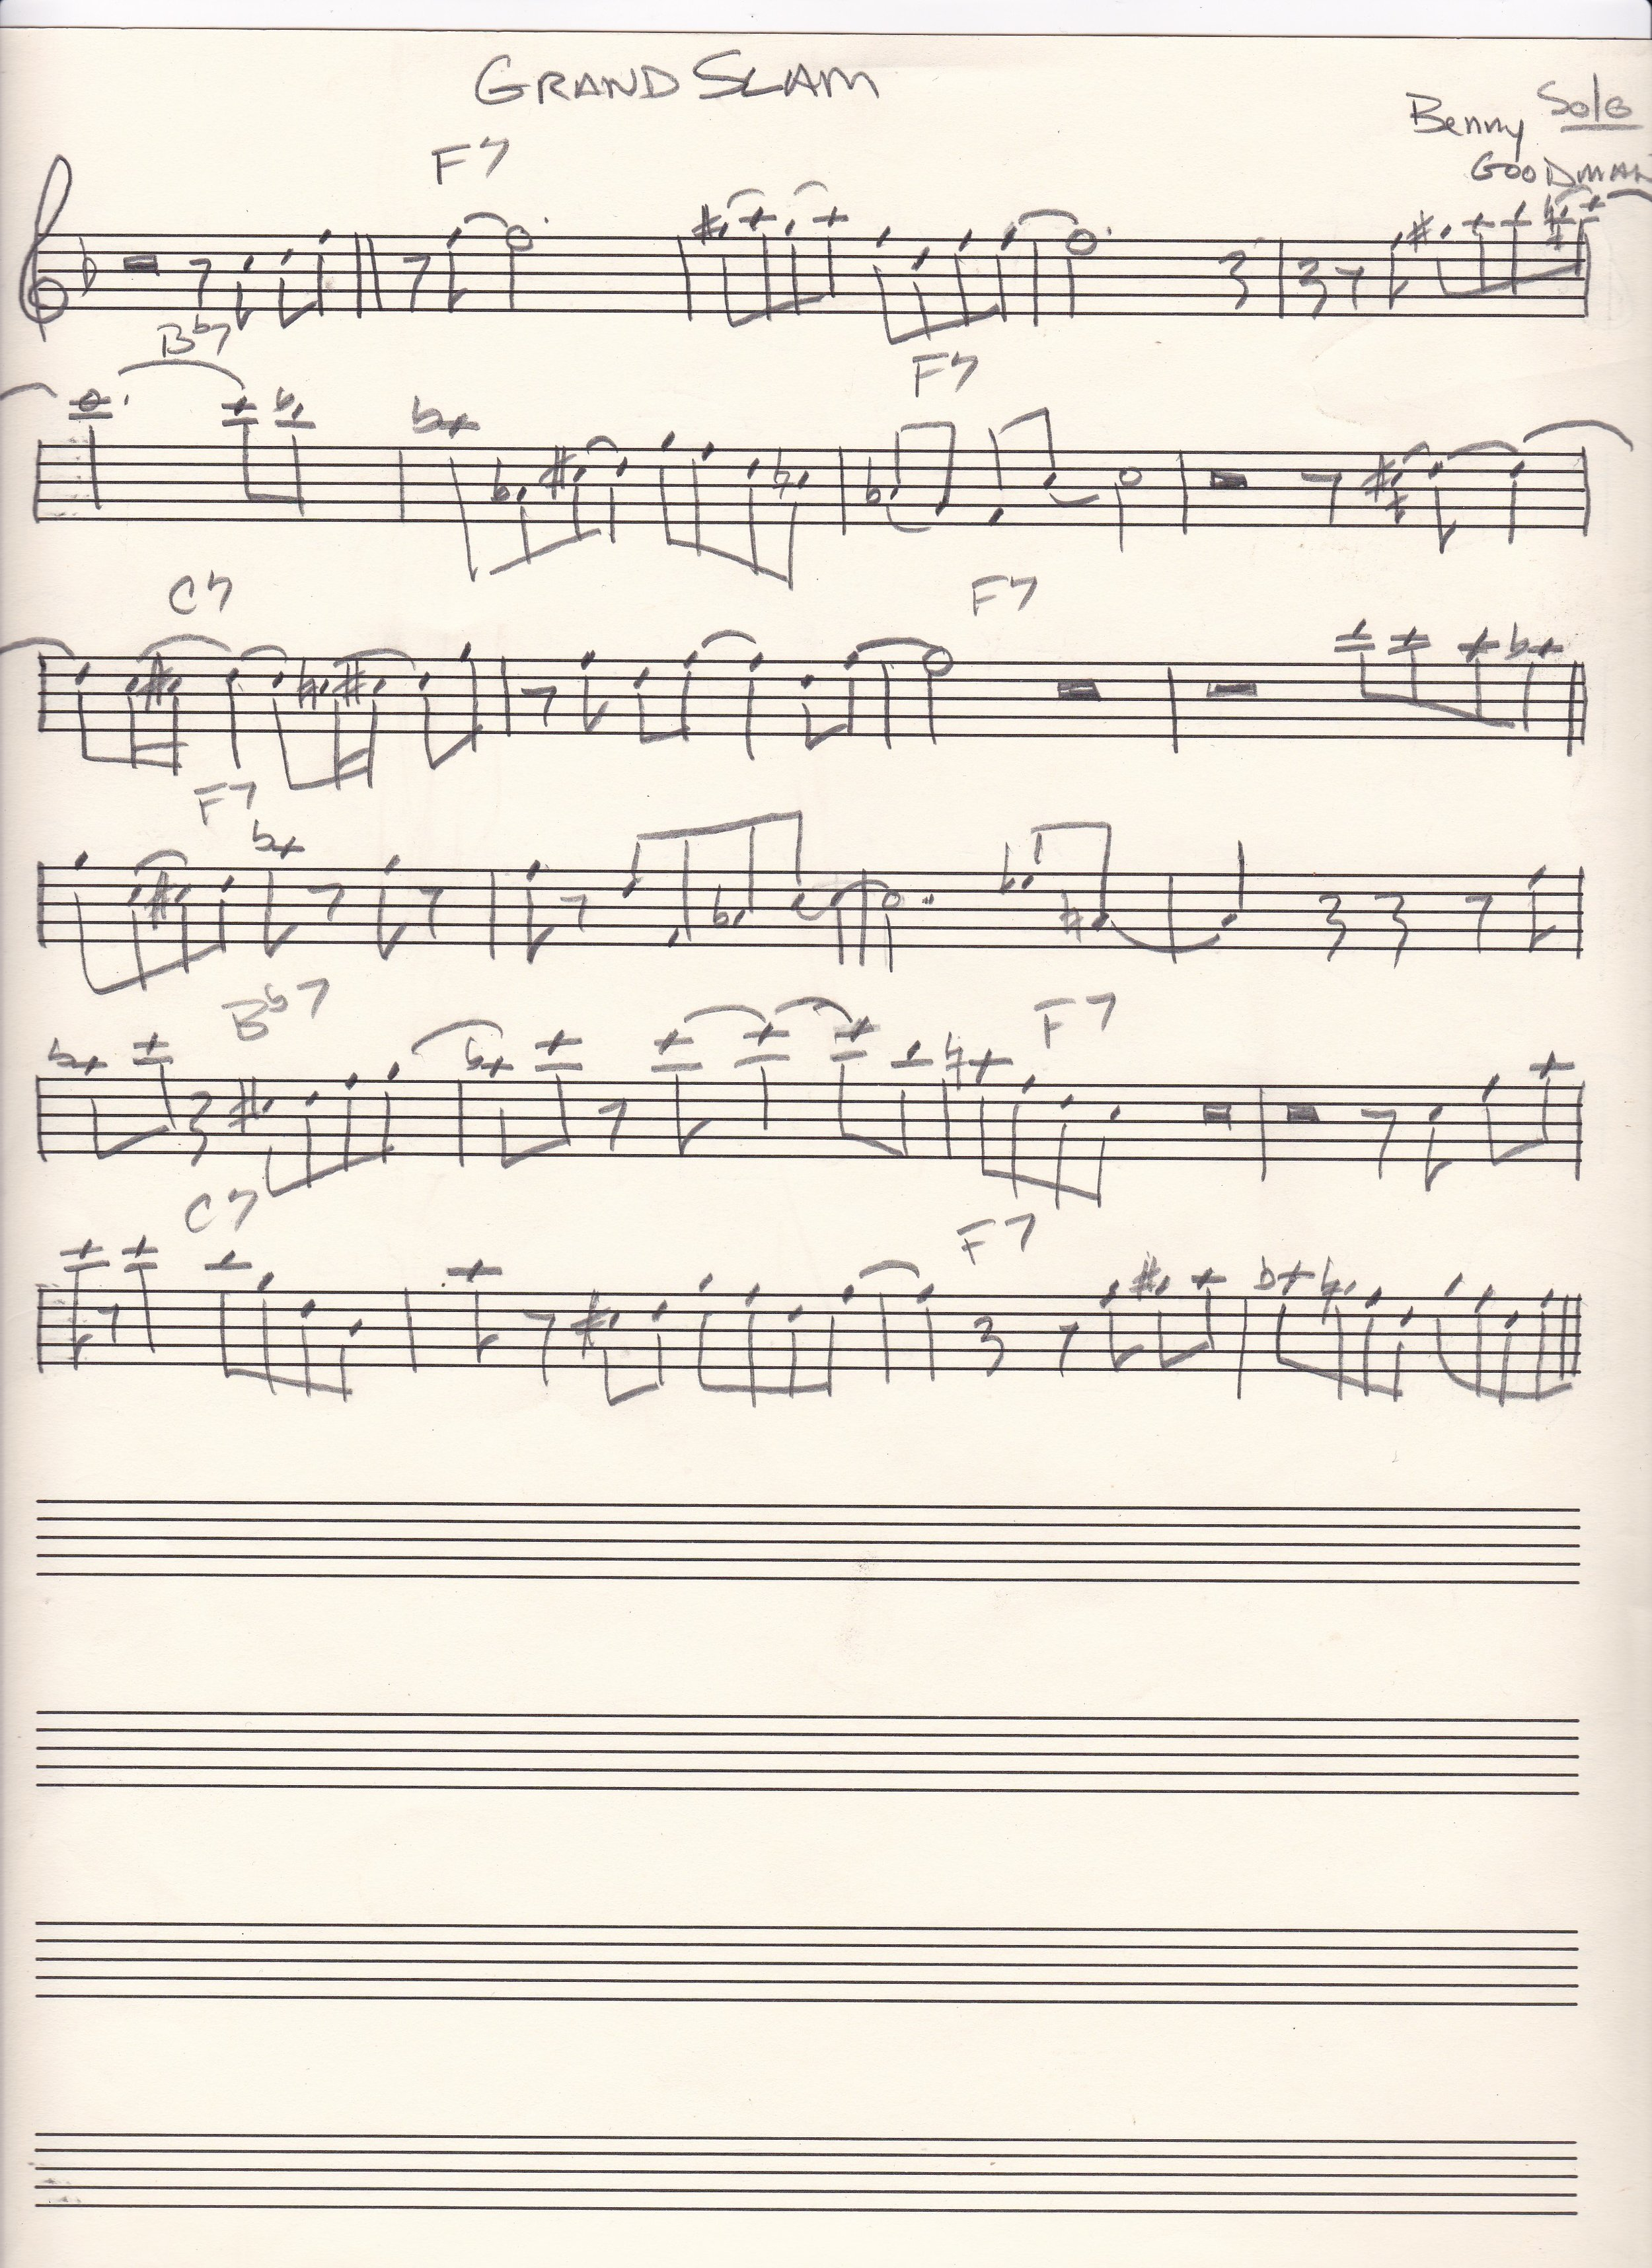 Grand Slam Benny Goodman's solo